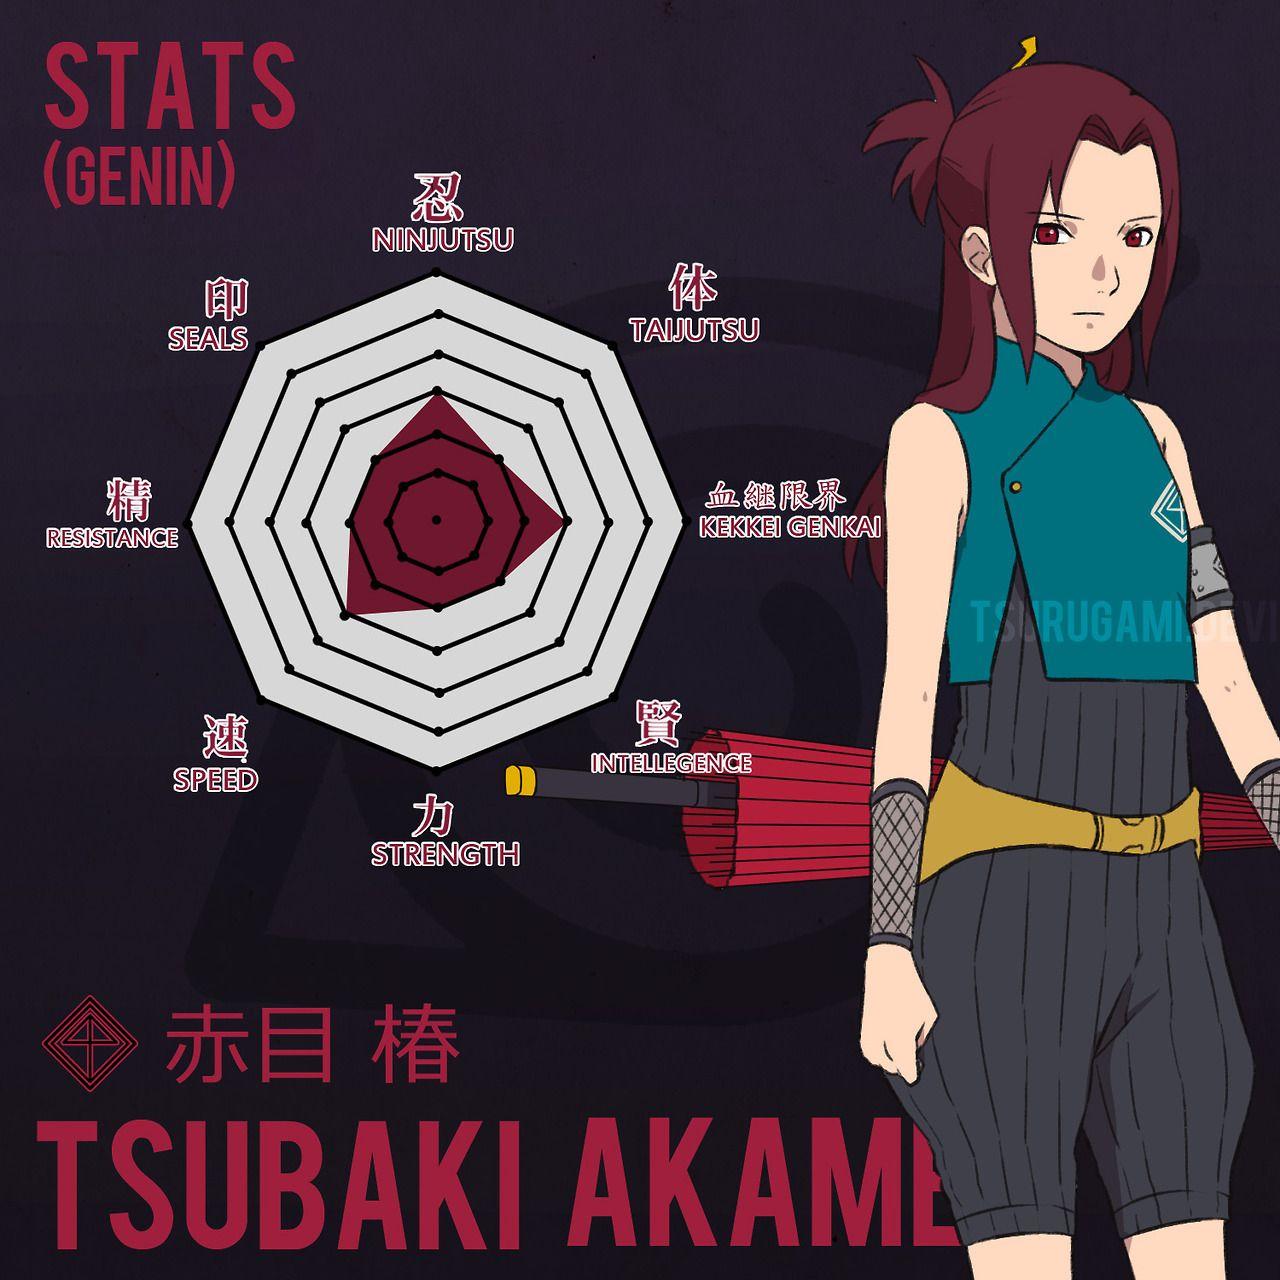 Tsurugami - Tsubaki stats cards ...   Naruto oc, Naruto oc characters, Naruto